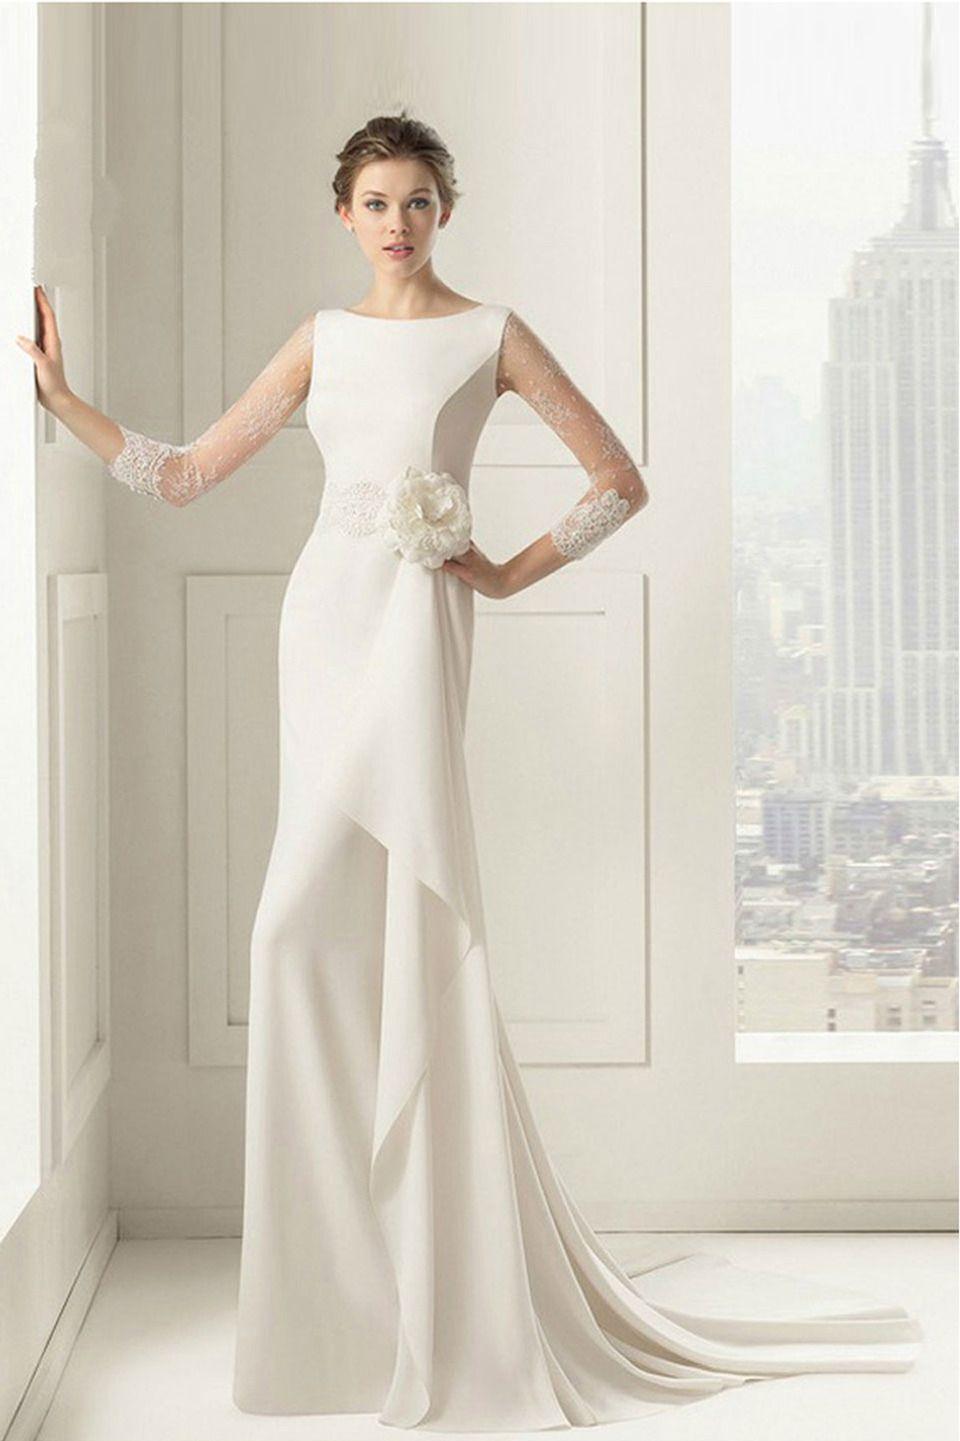 Vlan sleeveless draped hem wedding dress in white